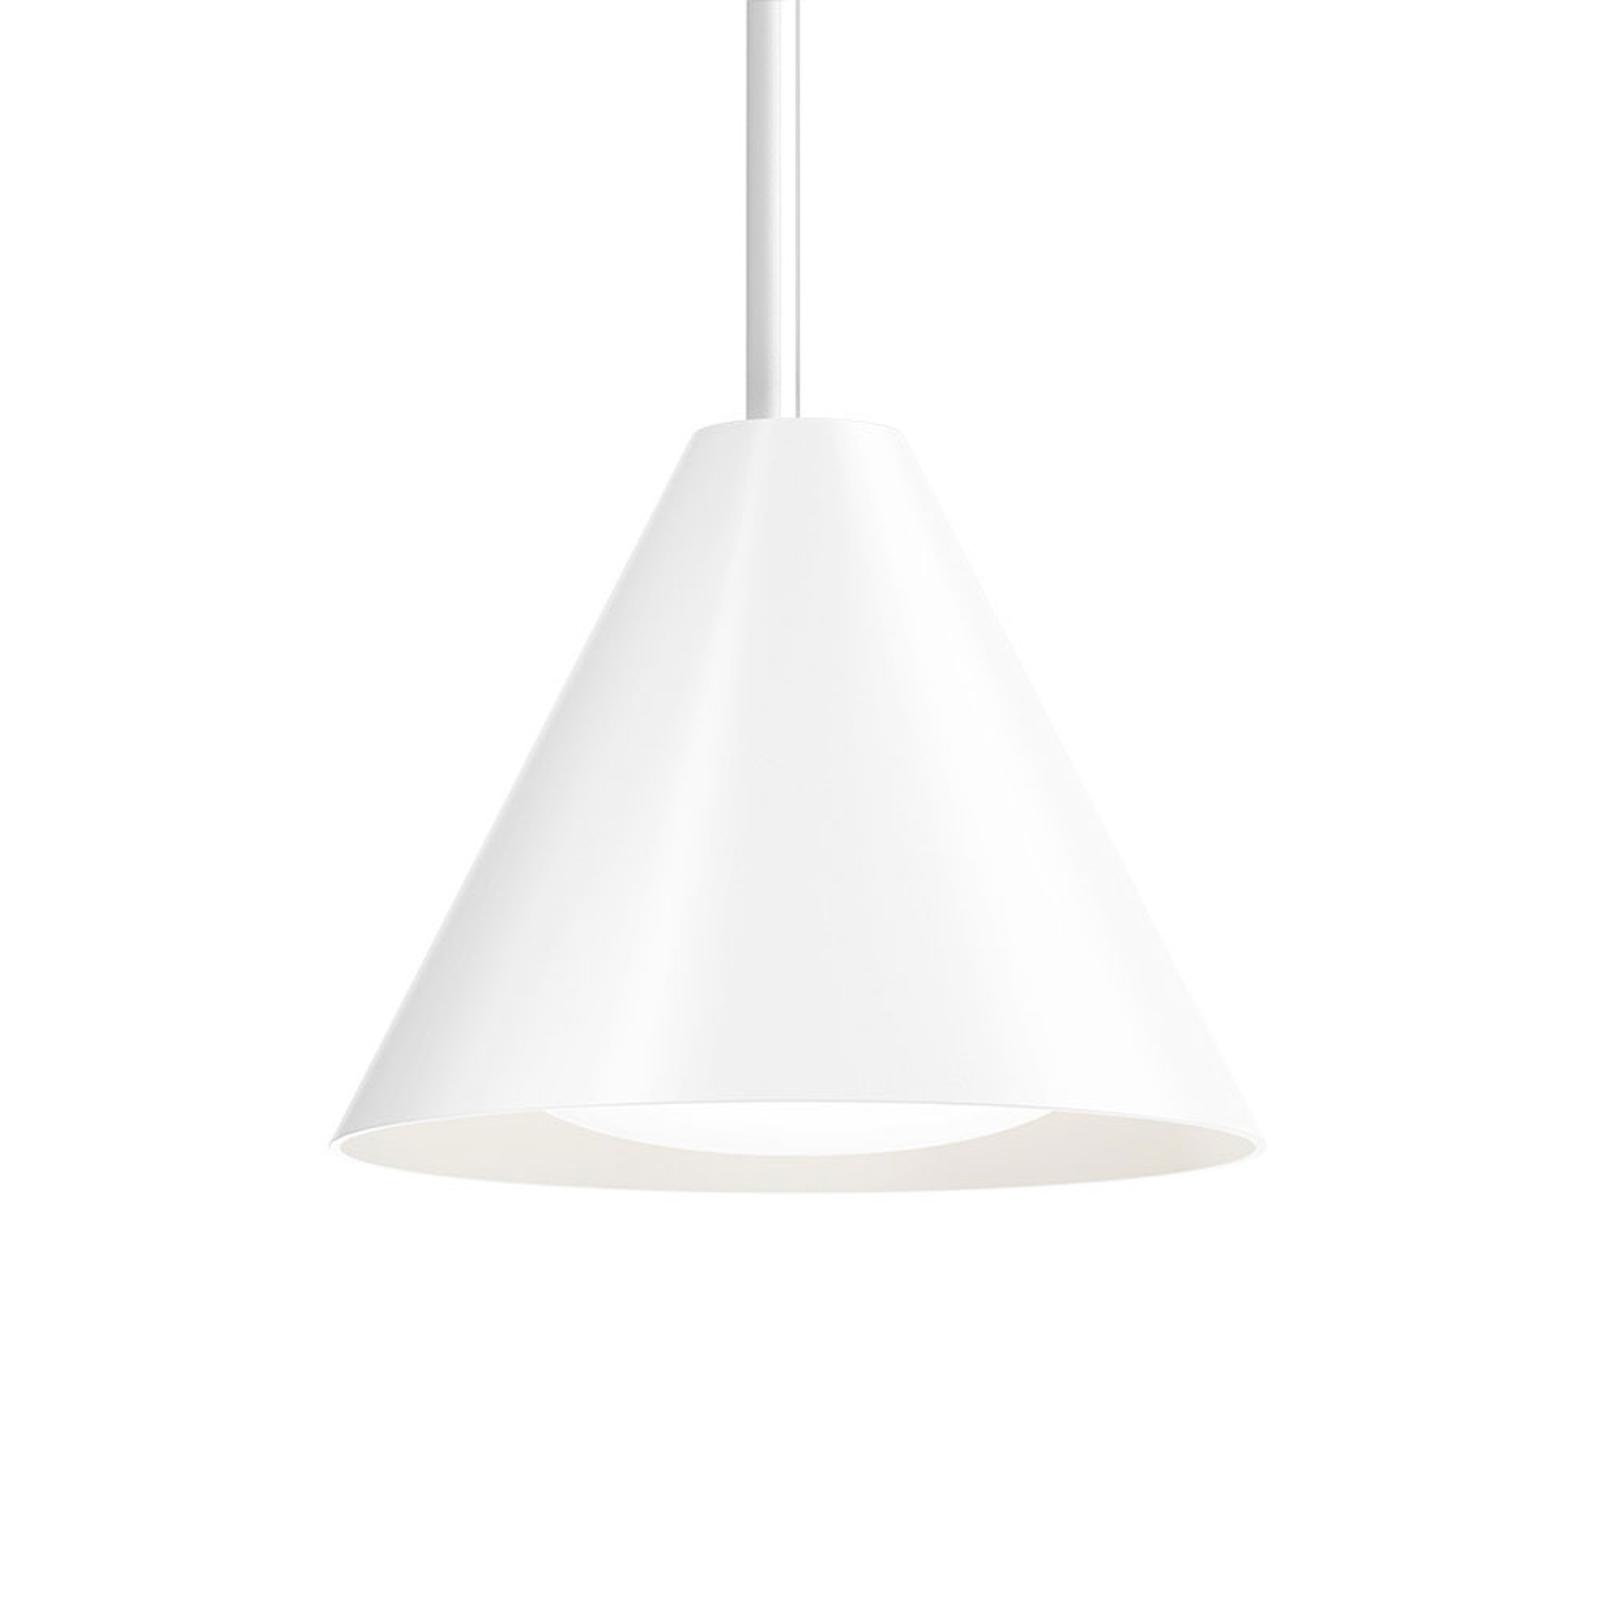 Louis Poulsen Keglen LED-Hängelampe 17,5cm weiß